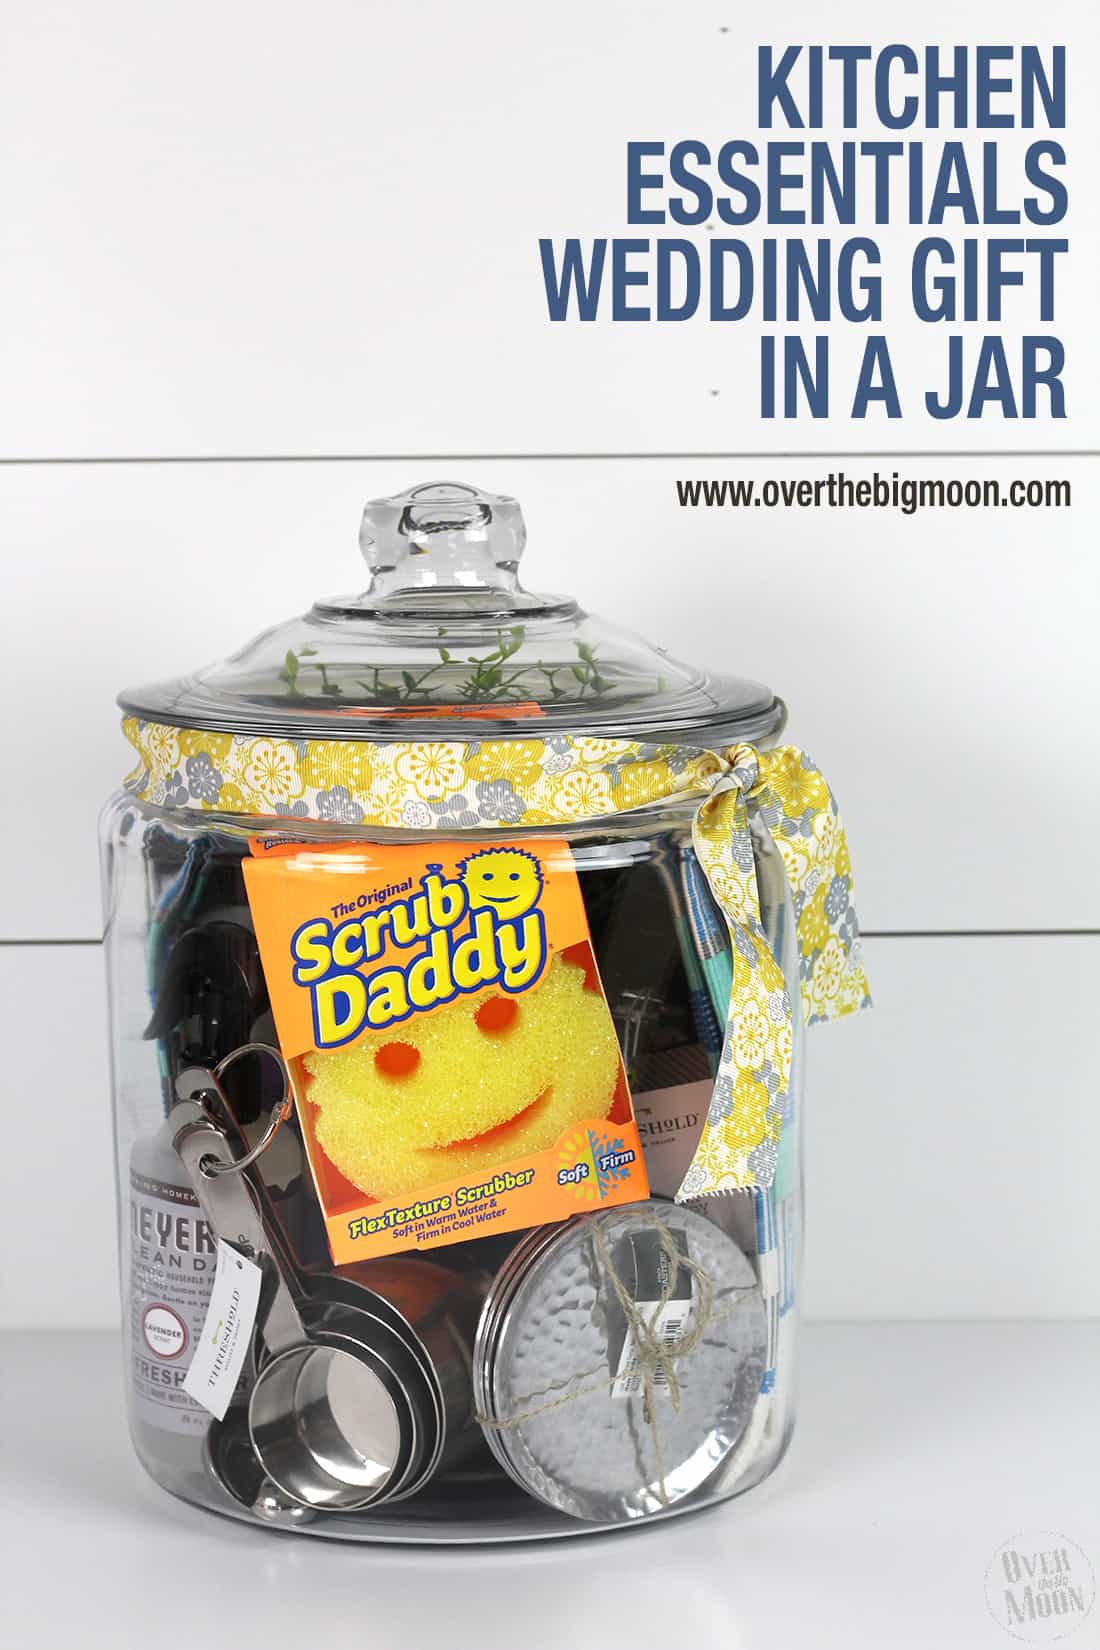 Kitchen Essentials Wedding Gift In A Jar Over The Big Moon